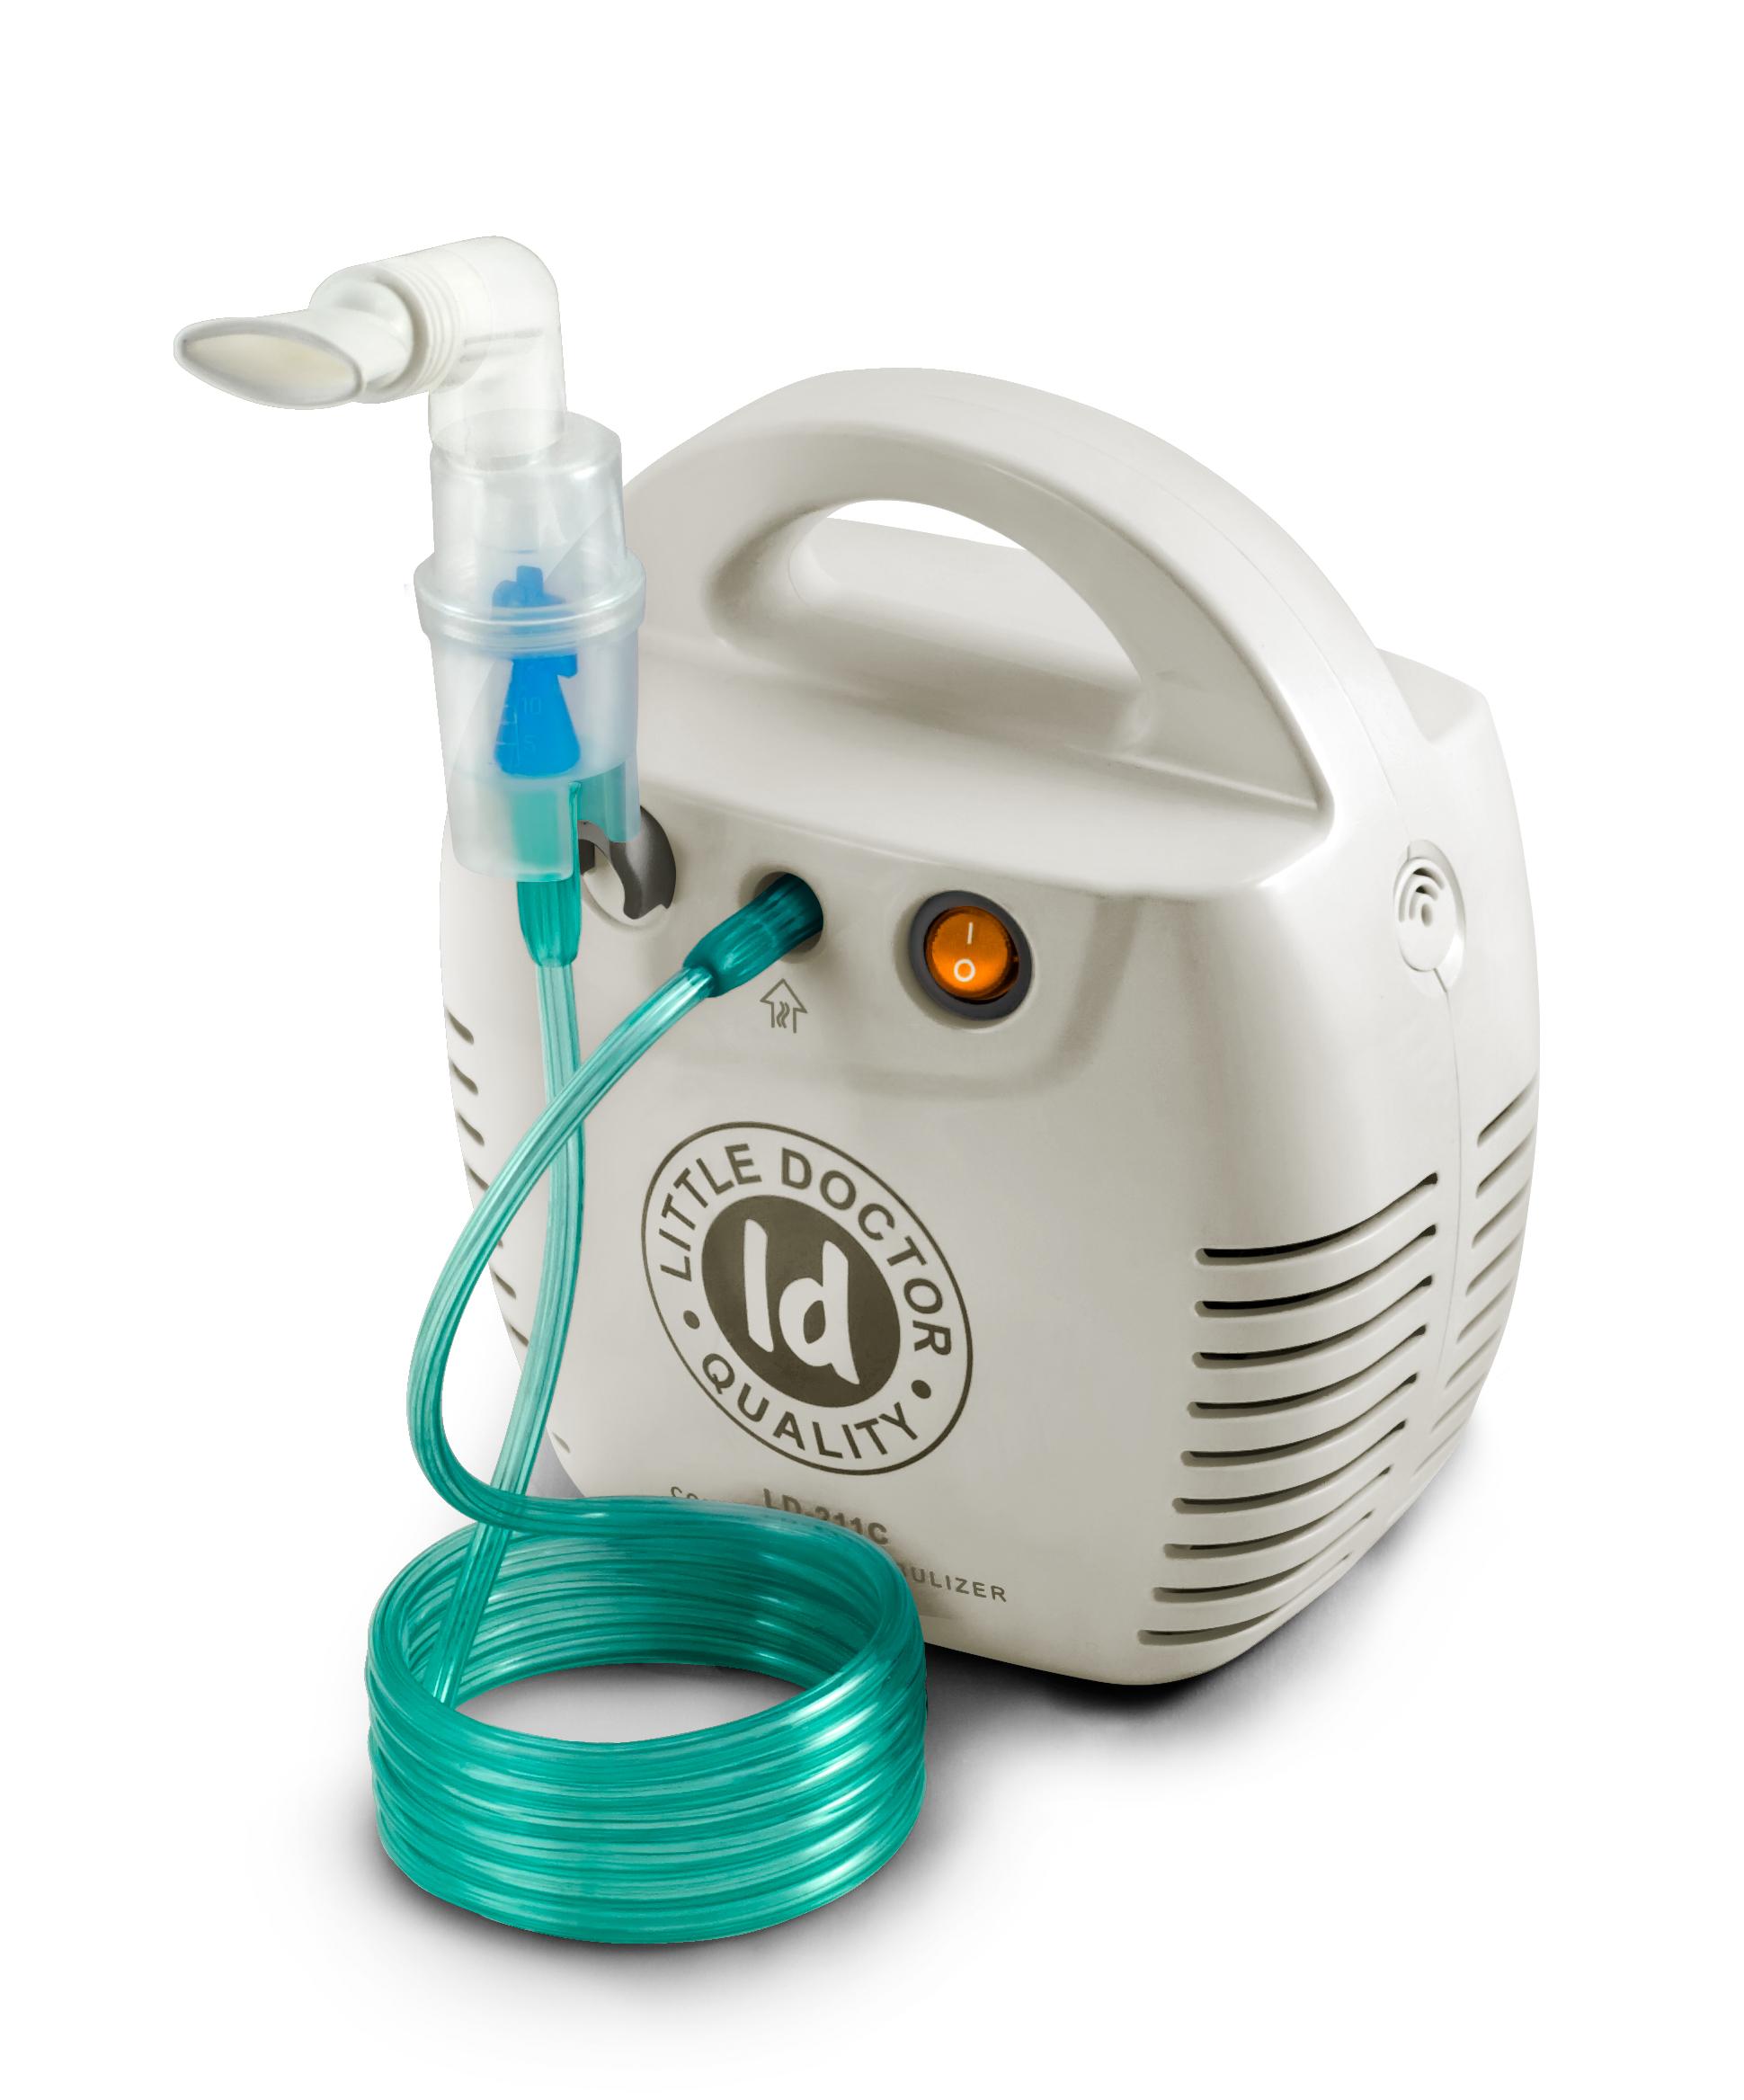 Little Doctor Ингалятор компрессорный LD-211 белый